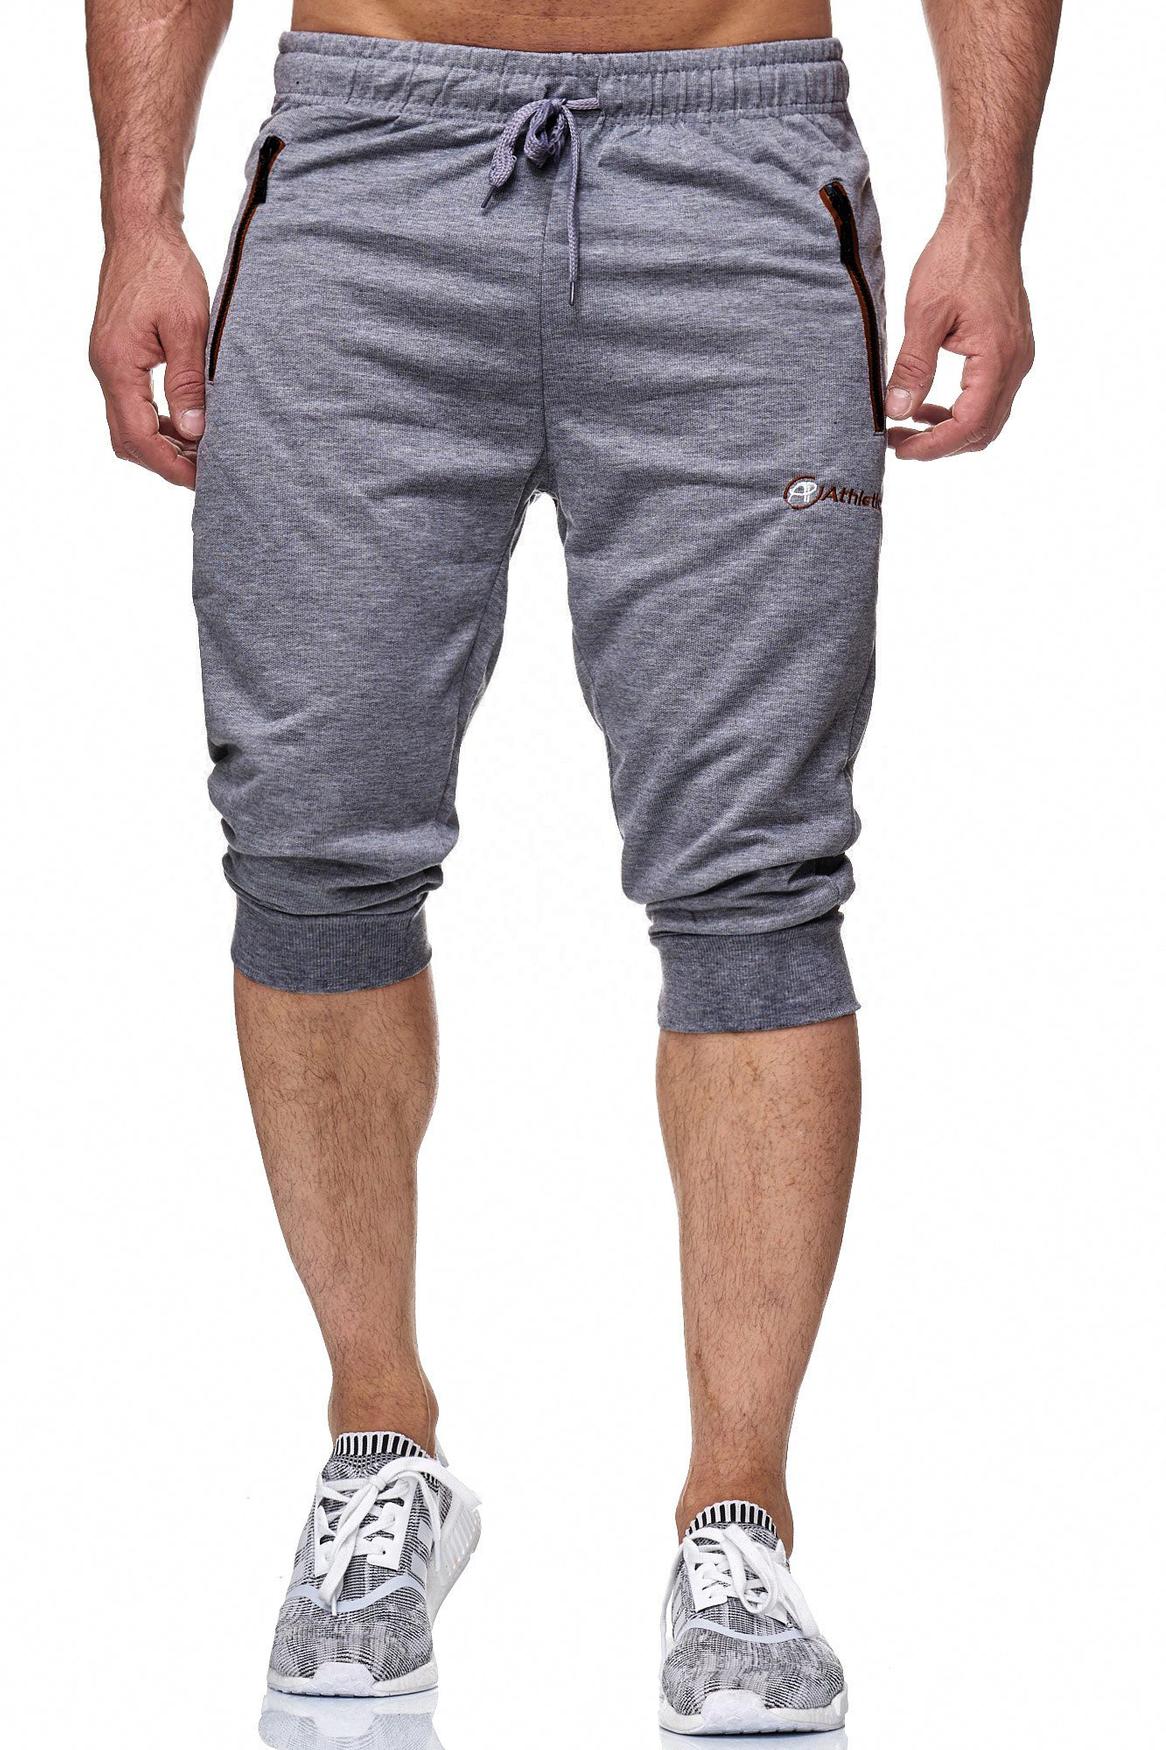 herren sweat shorts jogging 3 4 baumwolle neon zip 7 8 grau sport kurze hose neu ebay. Black Bedroom Furniture Sets. Home Design Ideas